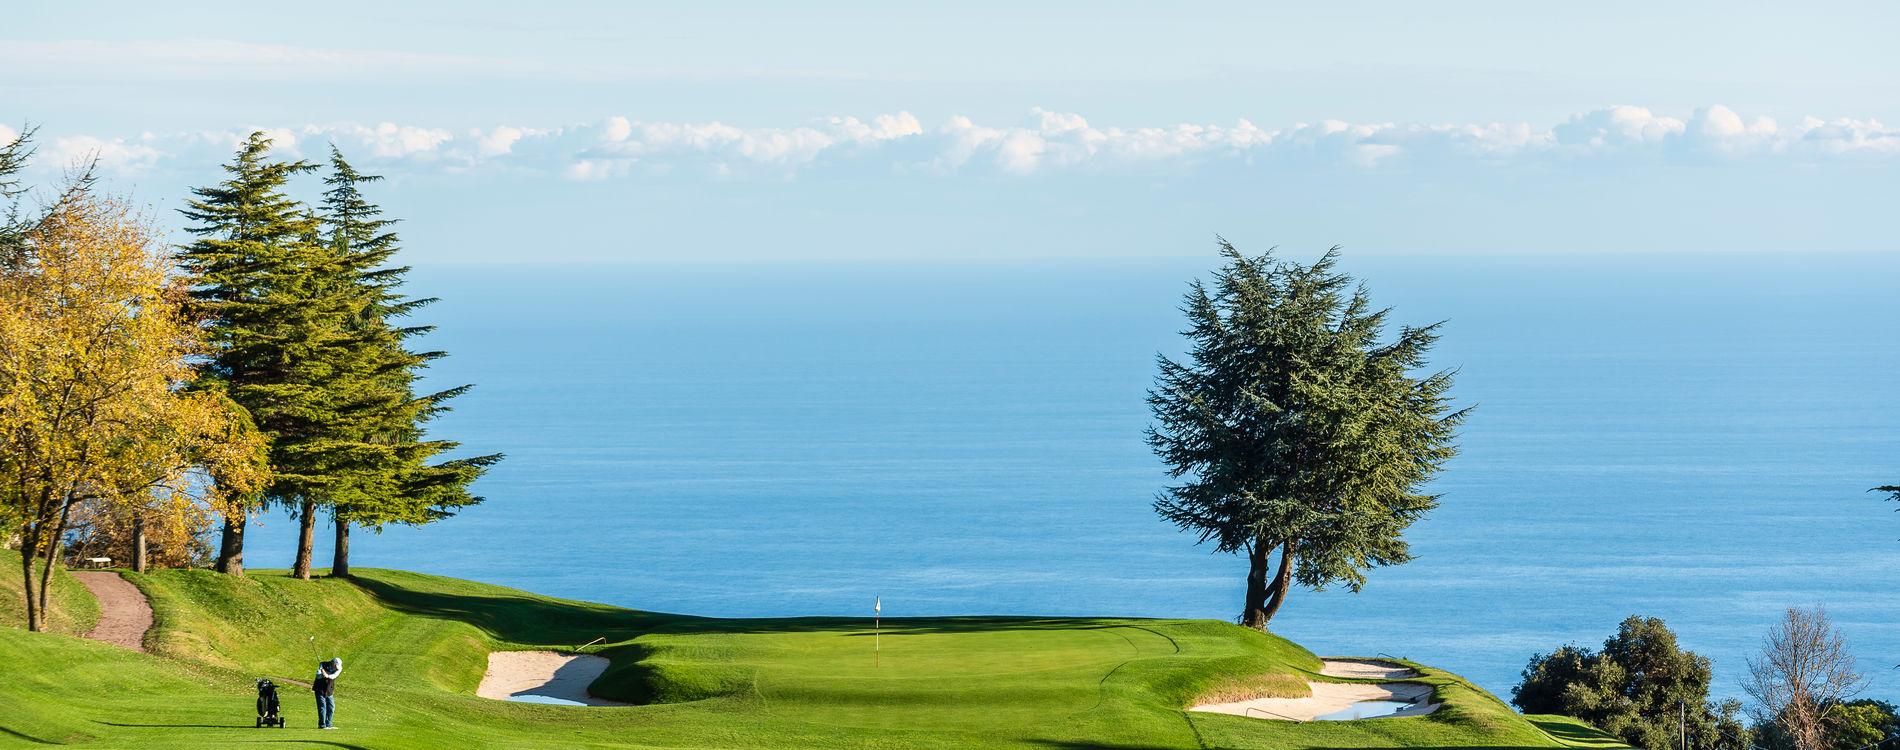 Monte-Carlo Golf Club - Parcours